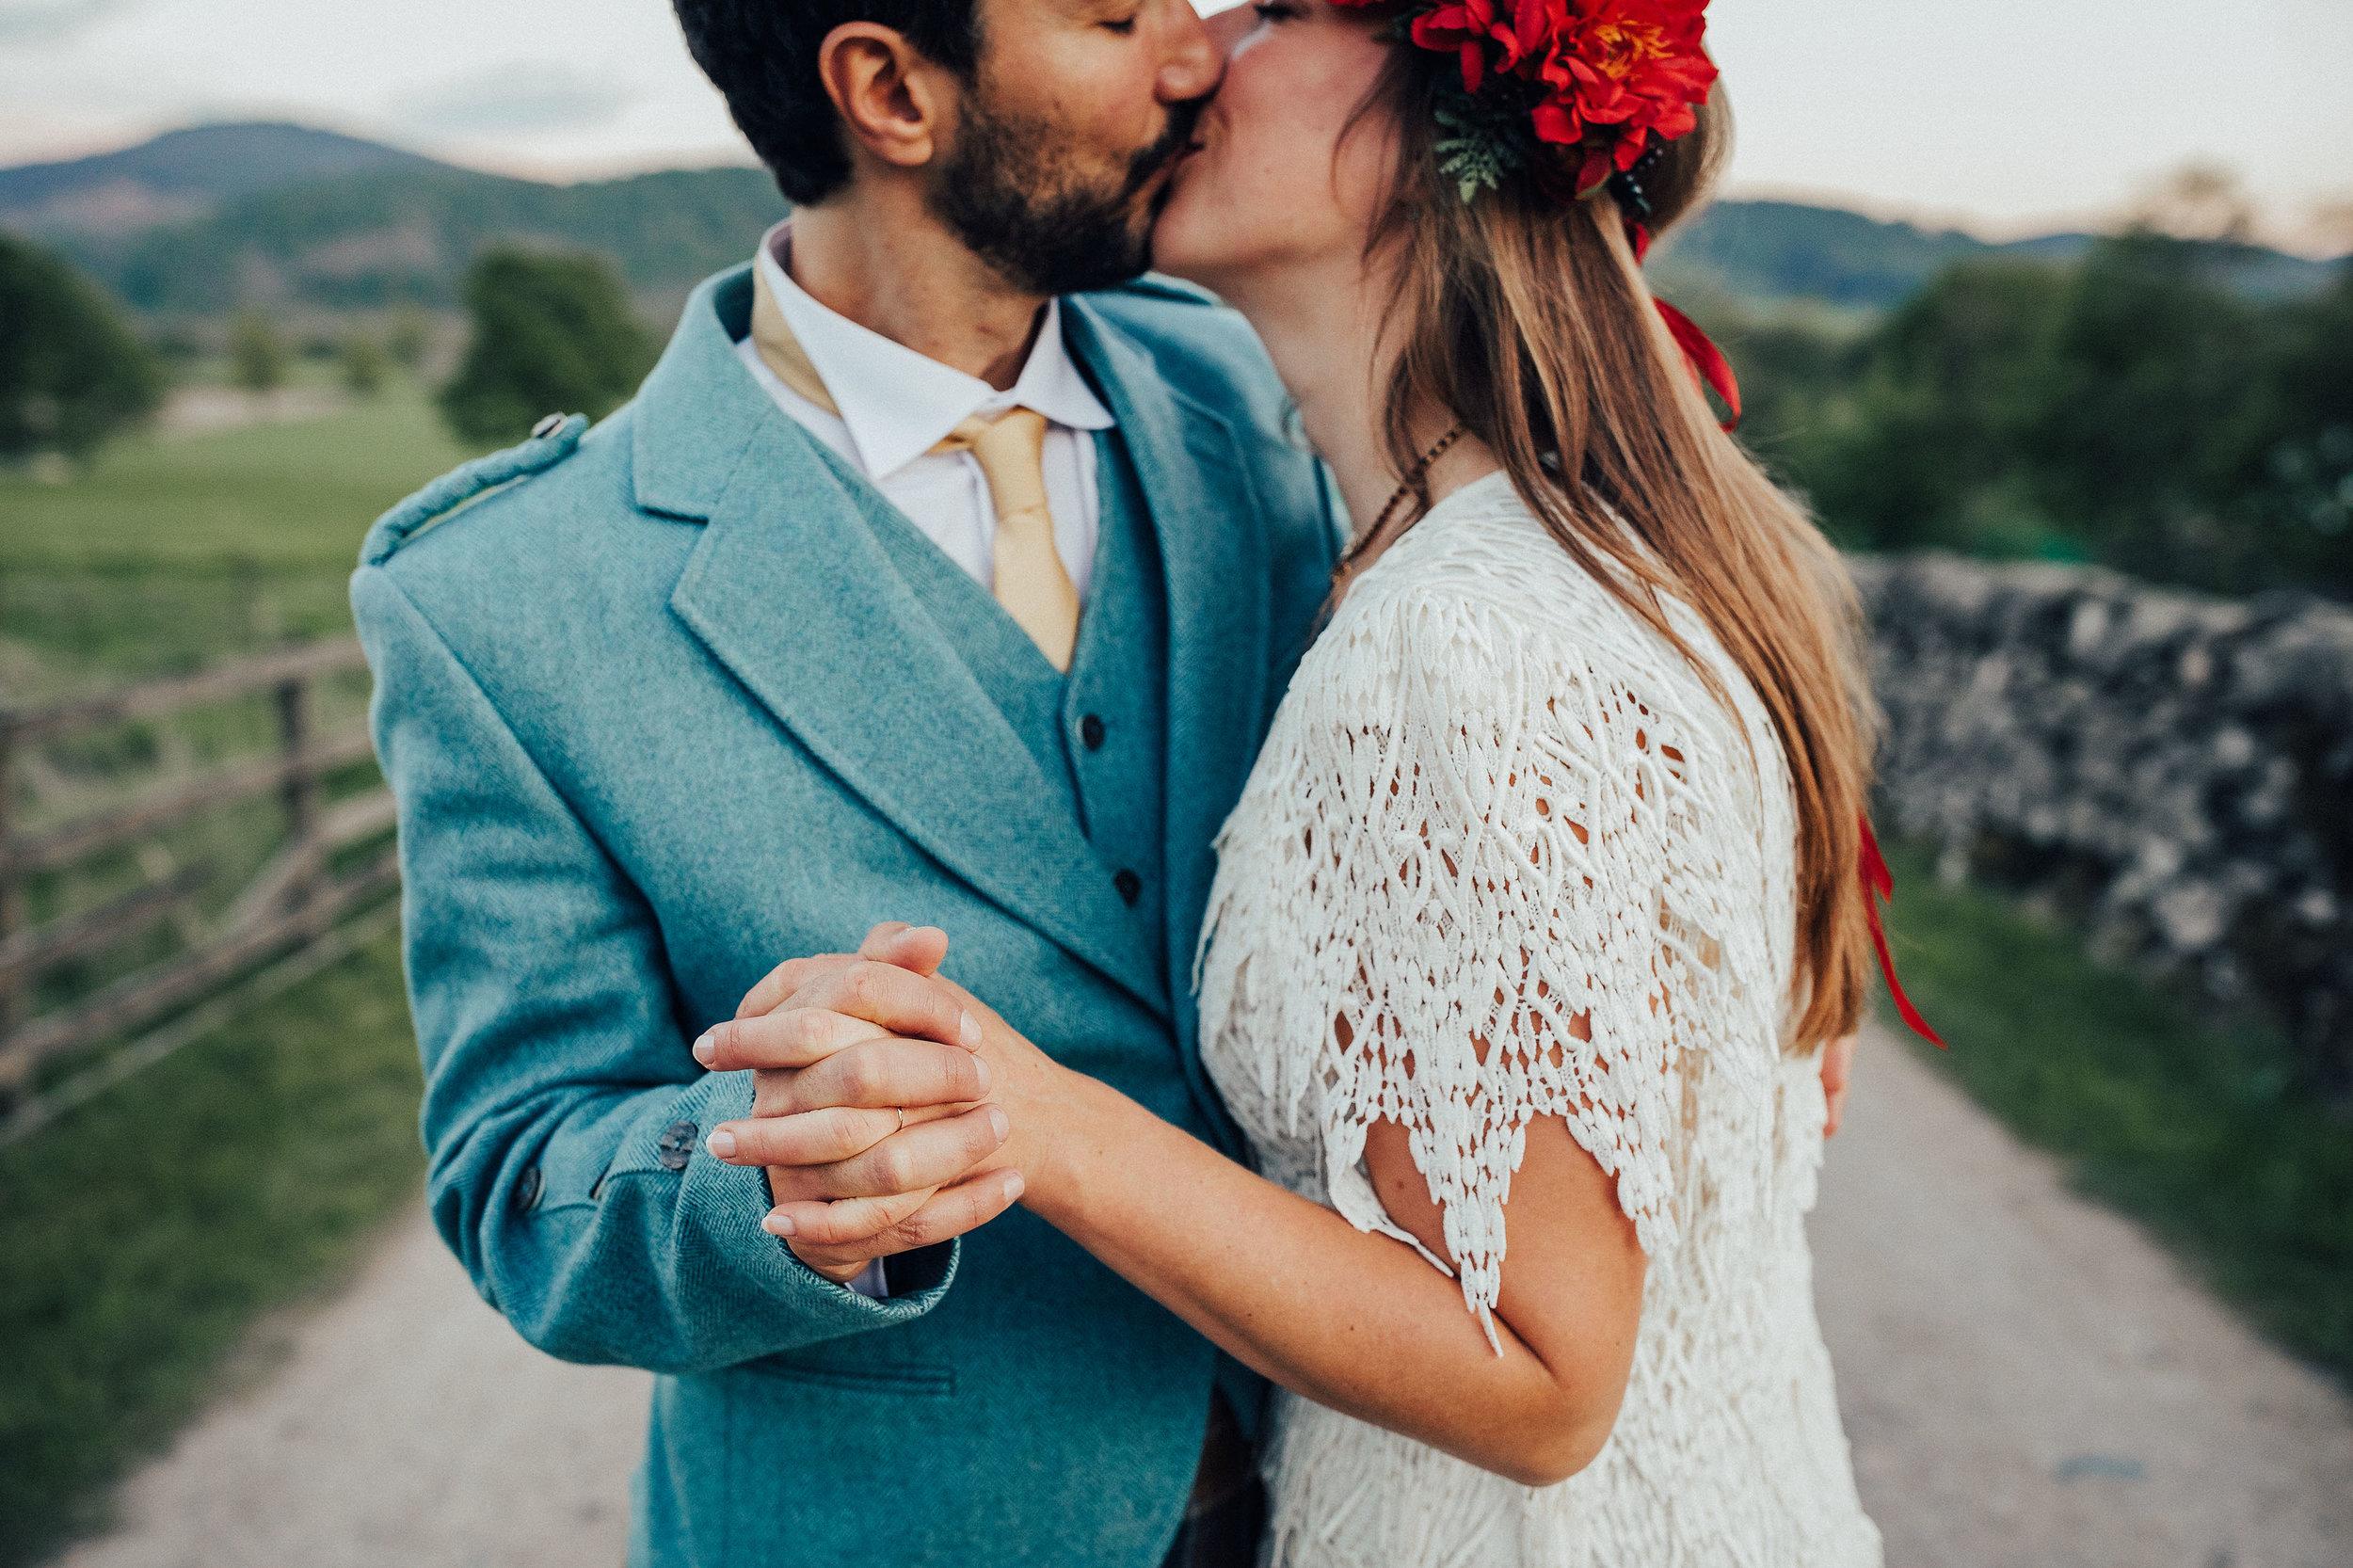 COMRIE_CROFT_WEDDINGS_PJ_PHILLIPS_PHOTOGRAPHY_193.jpg